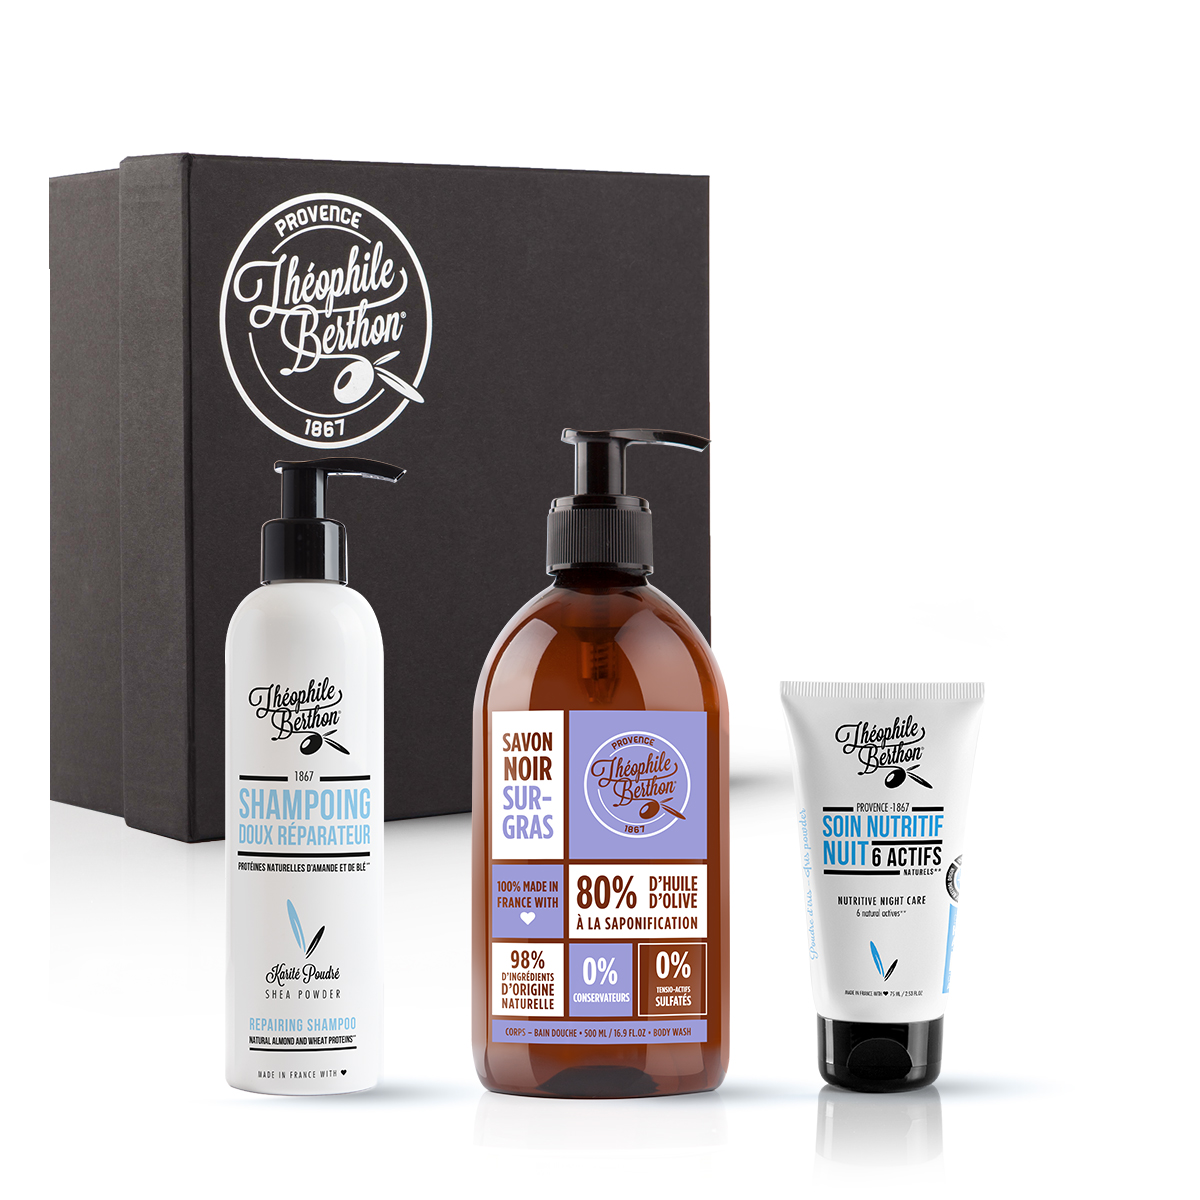 Coffret soin visage shampoing et savon liquide de Marseille